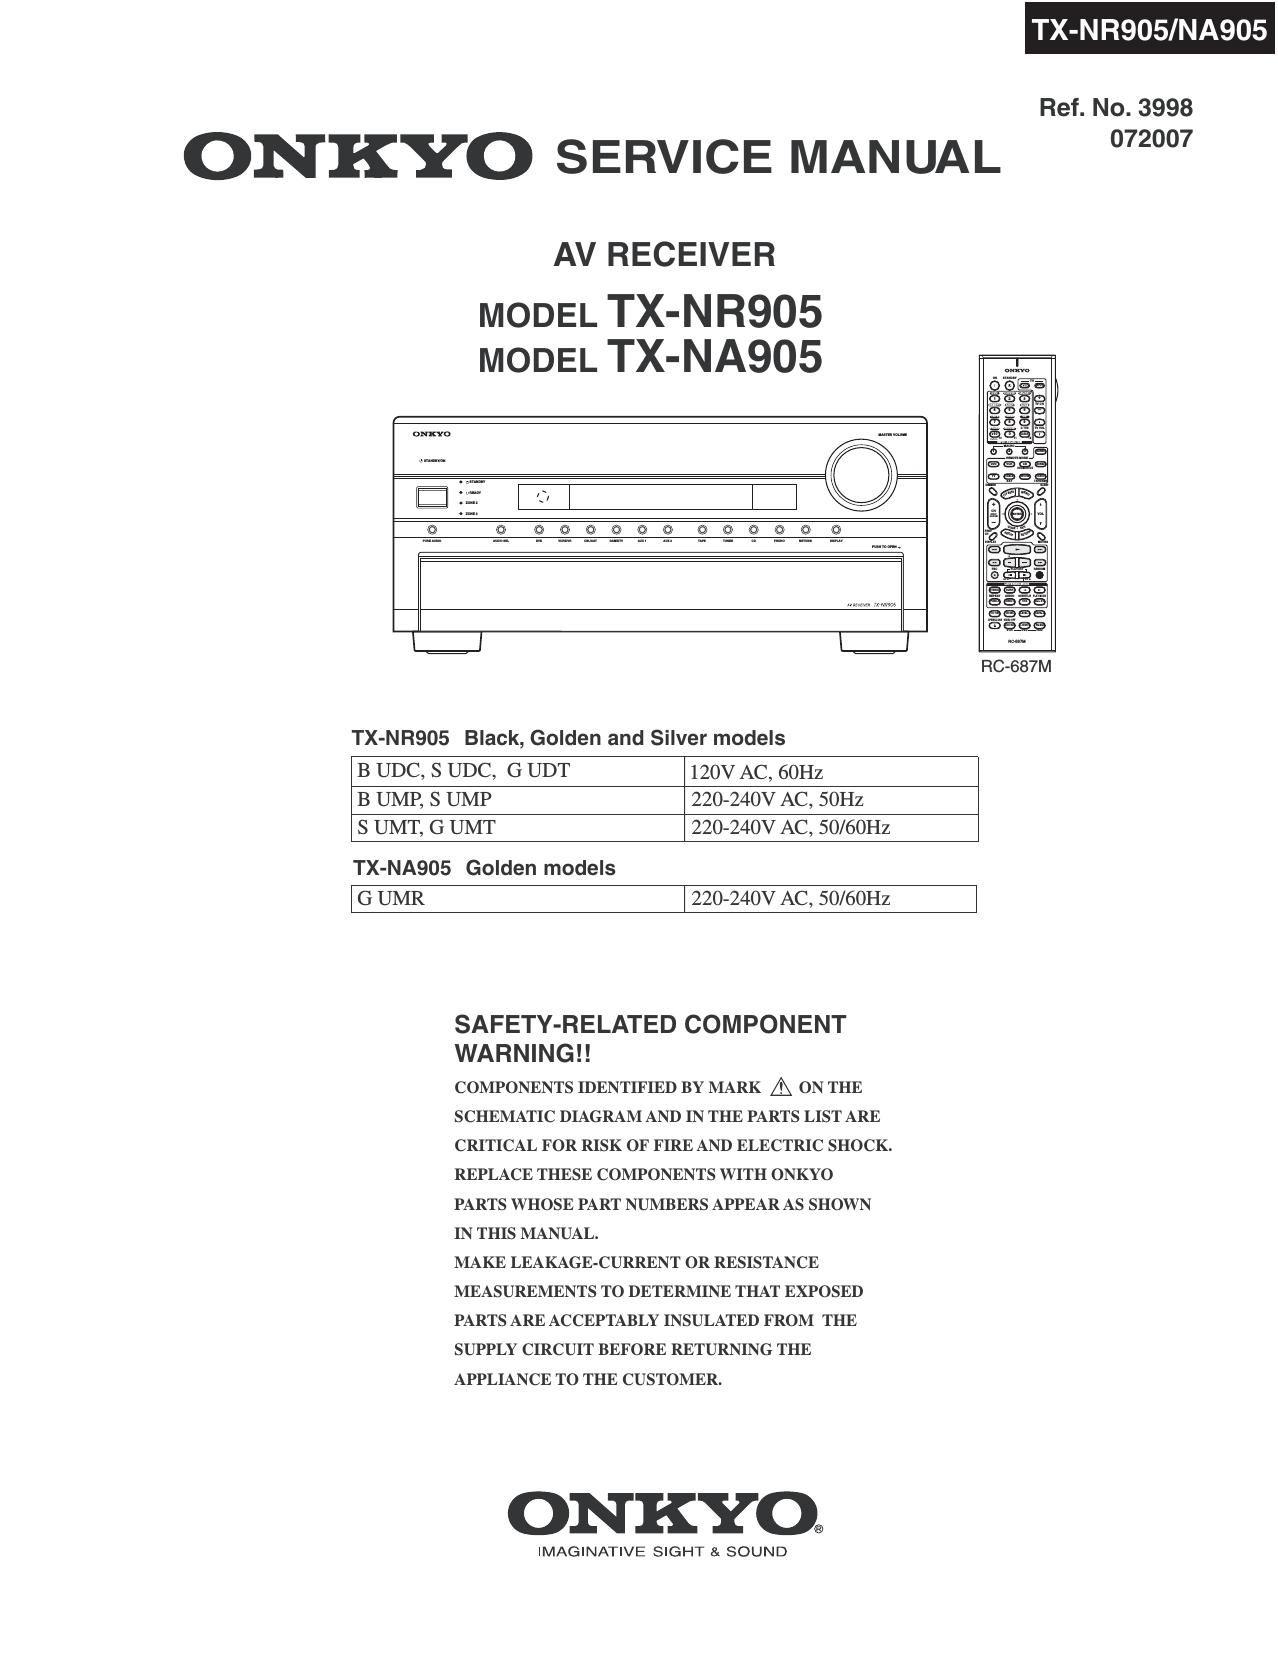 onkyo txnr 905 service manual rh audioservicemanuals com onkyo a 905 service manual